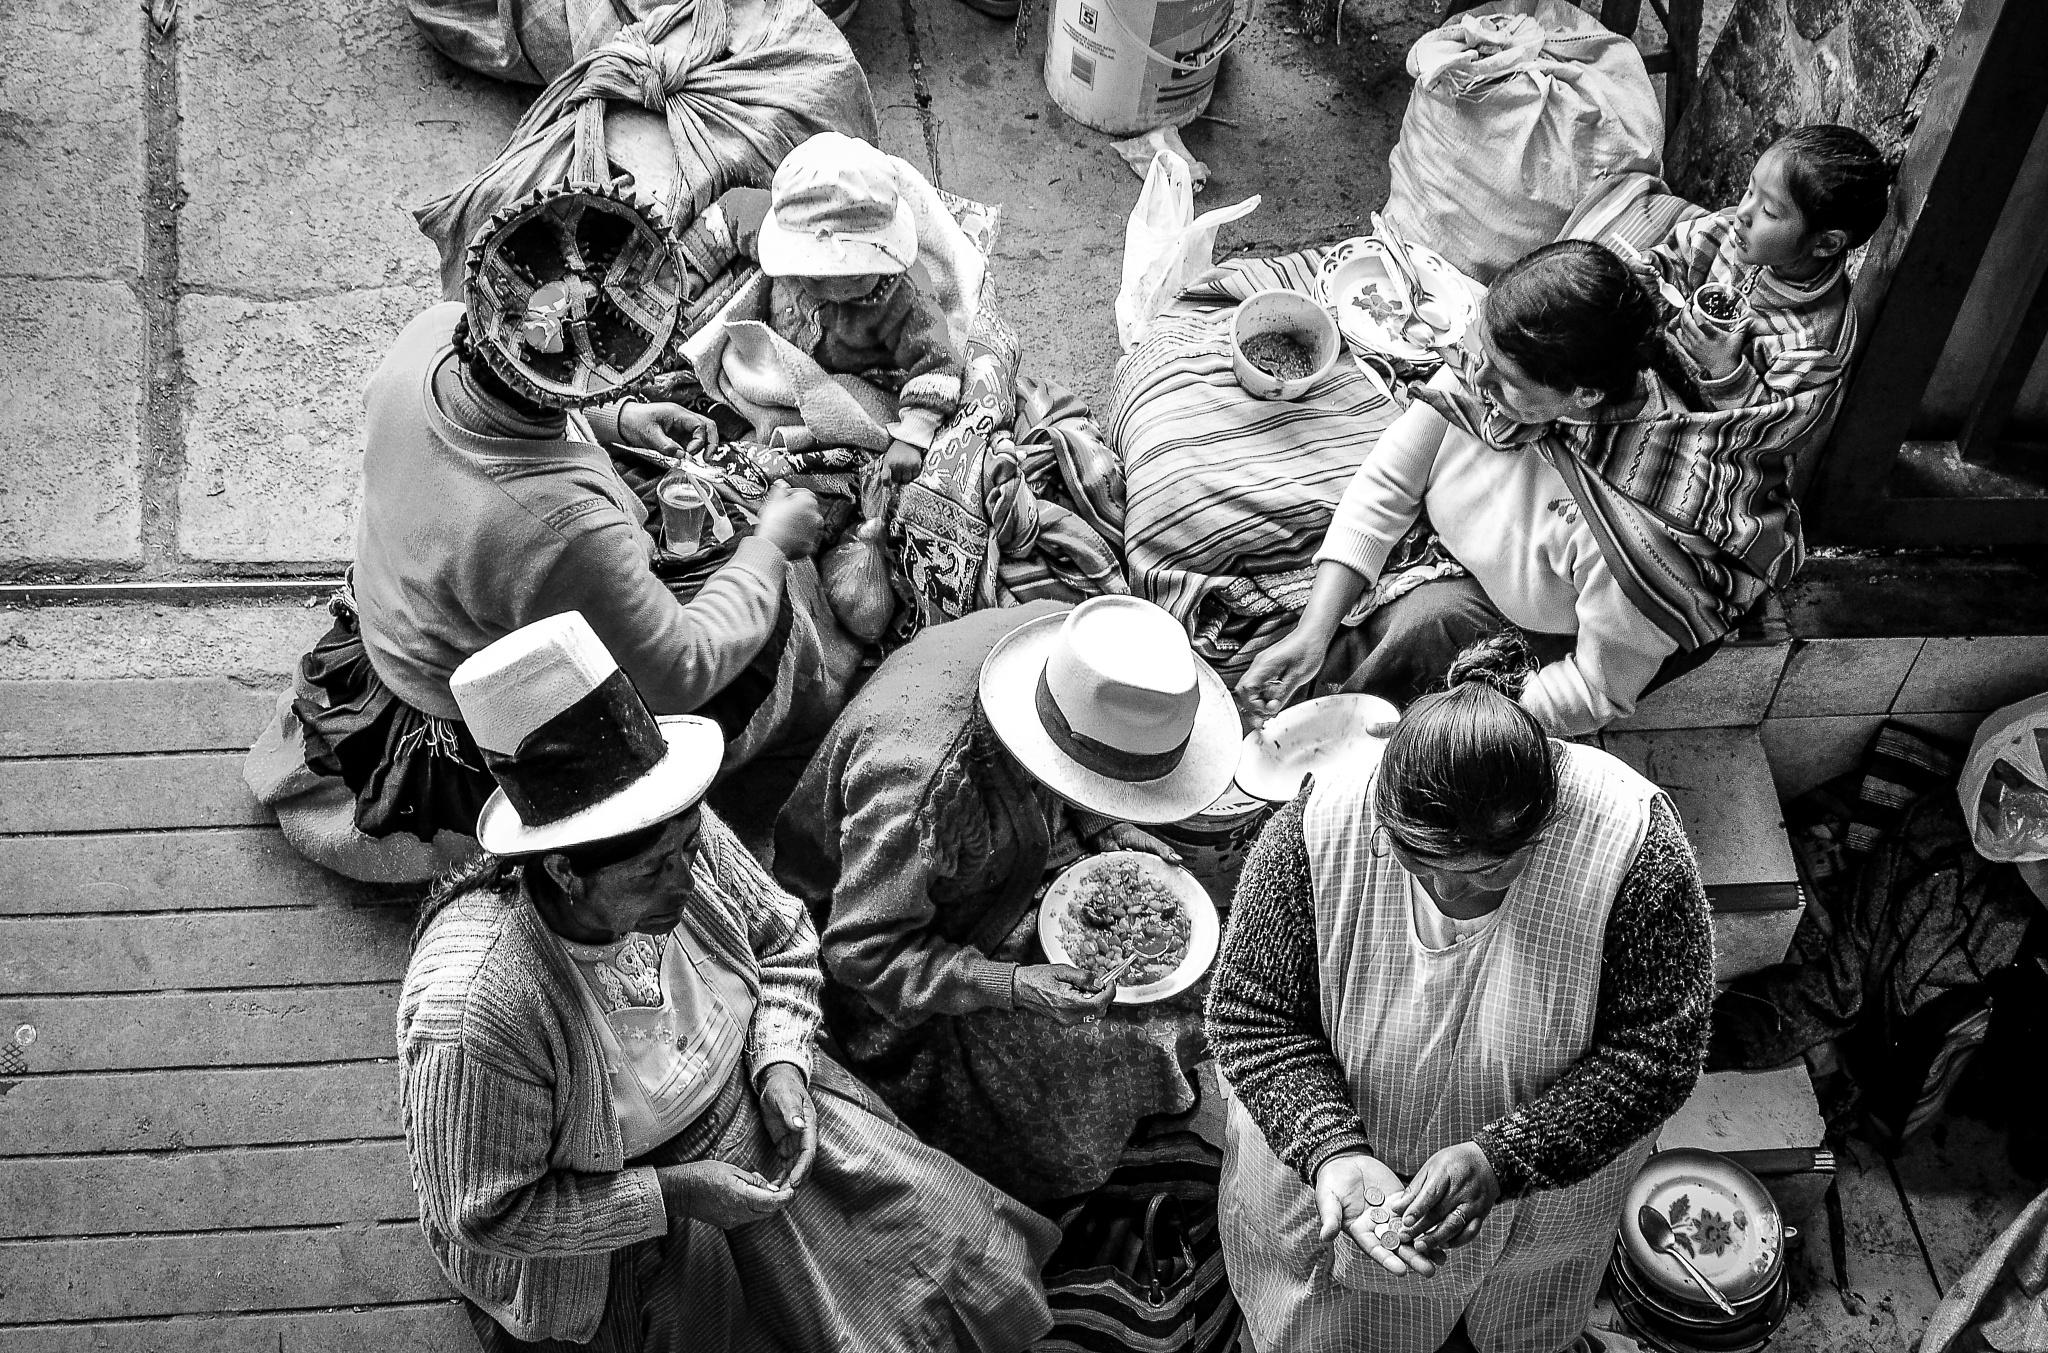 PERU. Ollantaytambo. 2014 by Marcio Bertolucci